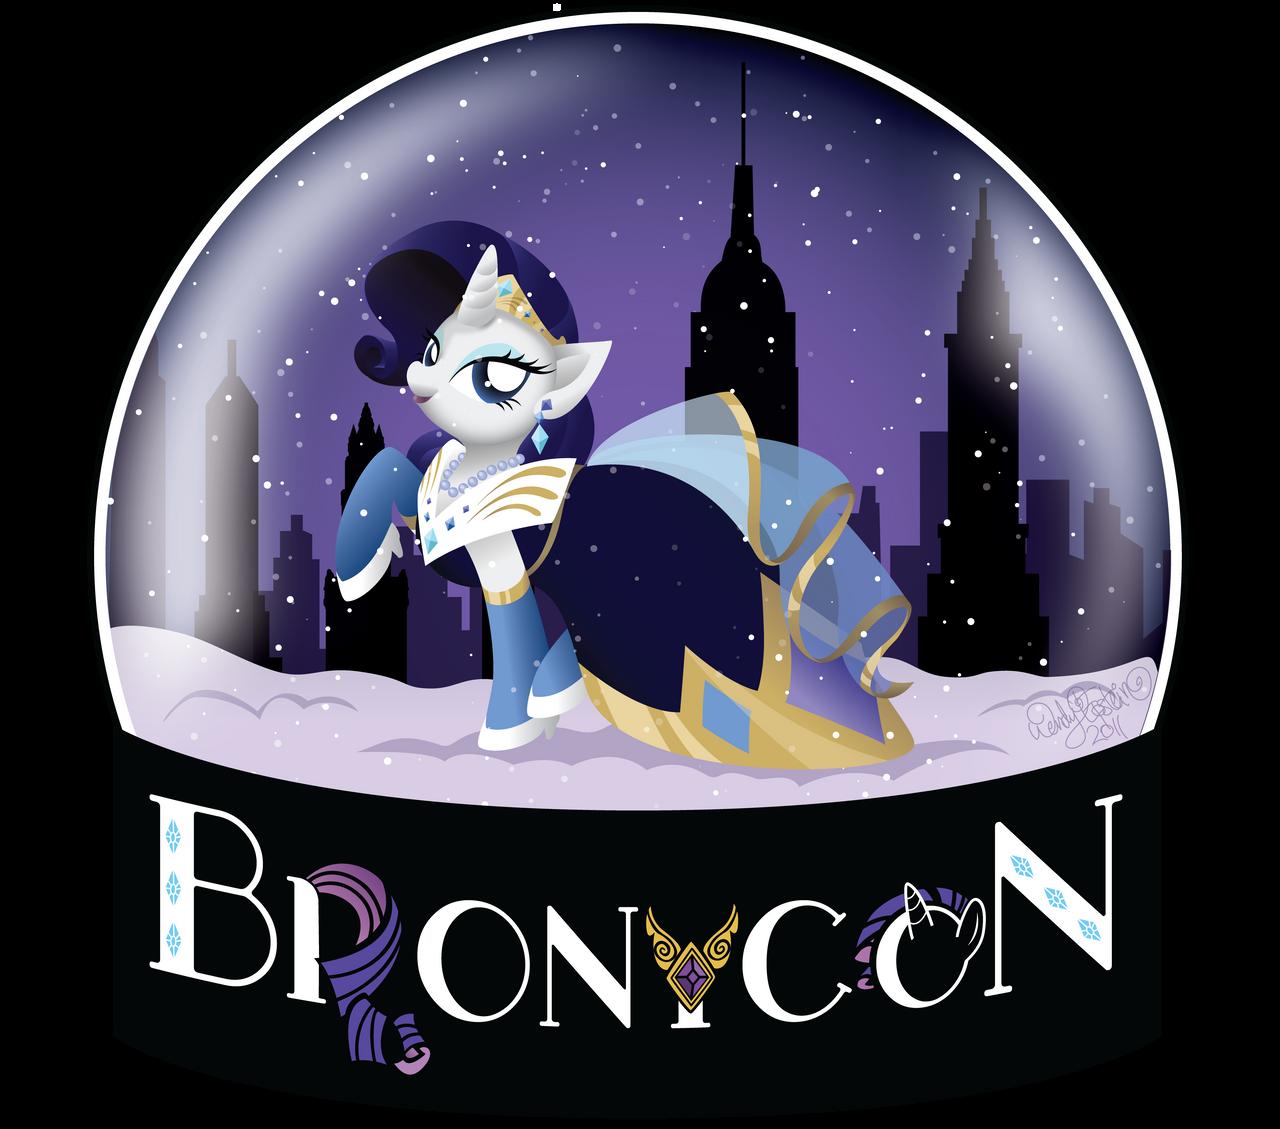 Bronycon Logo   www.imgkid.com - The Image Kid Has It!